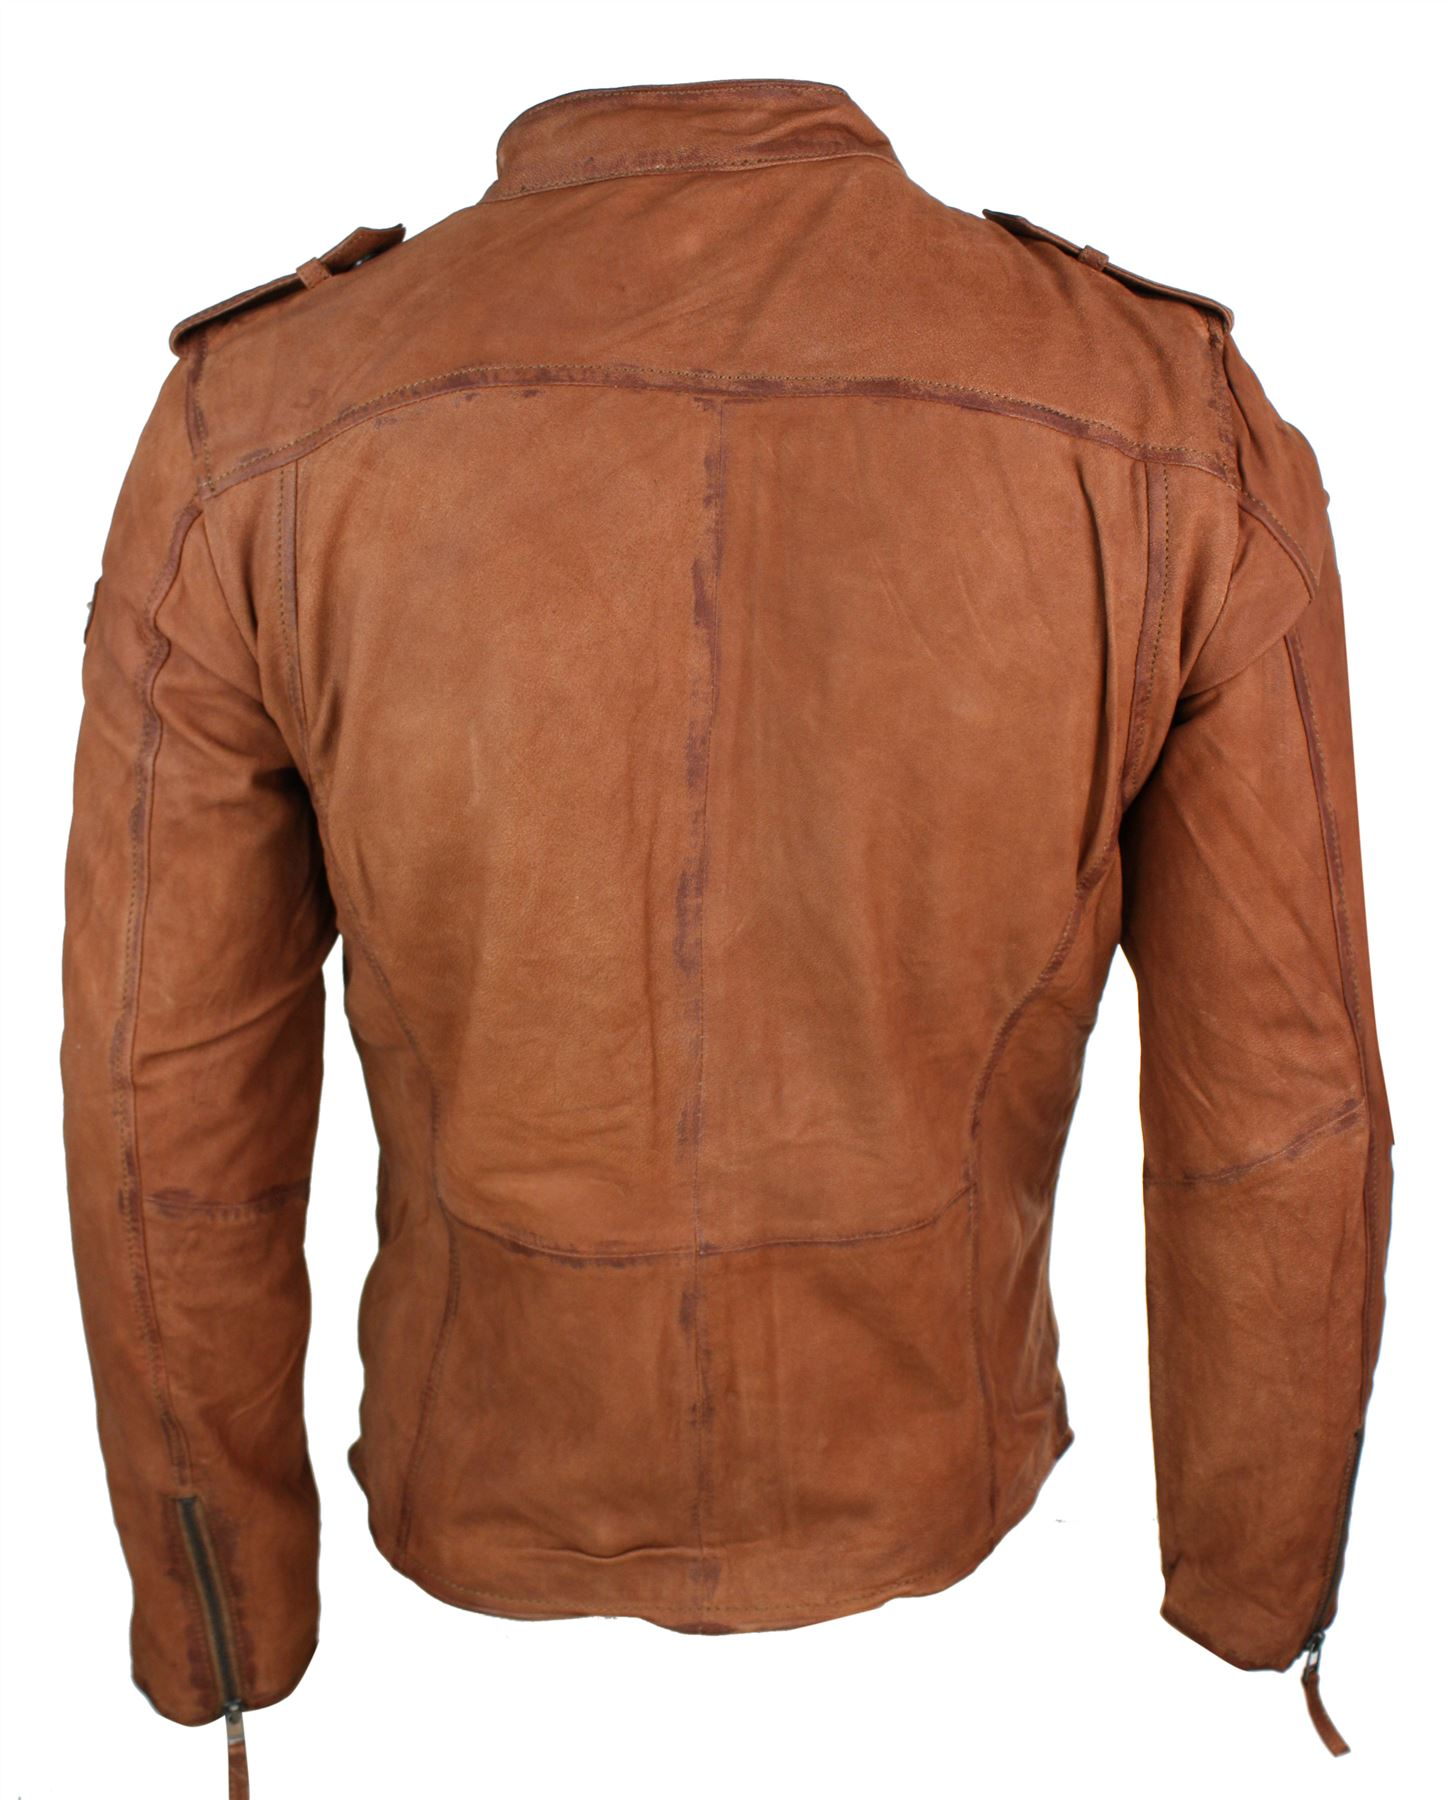 48a4f828bf3 Veste motard zippée cintrée cuir véritable délavé vintage ...